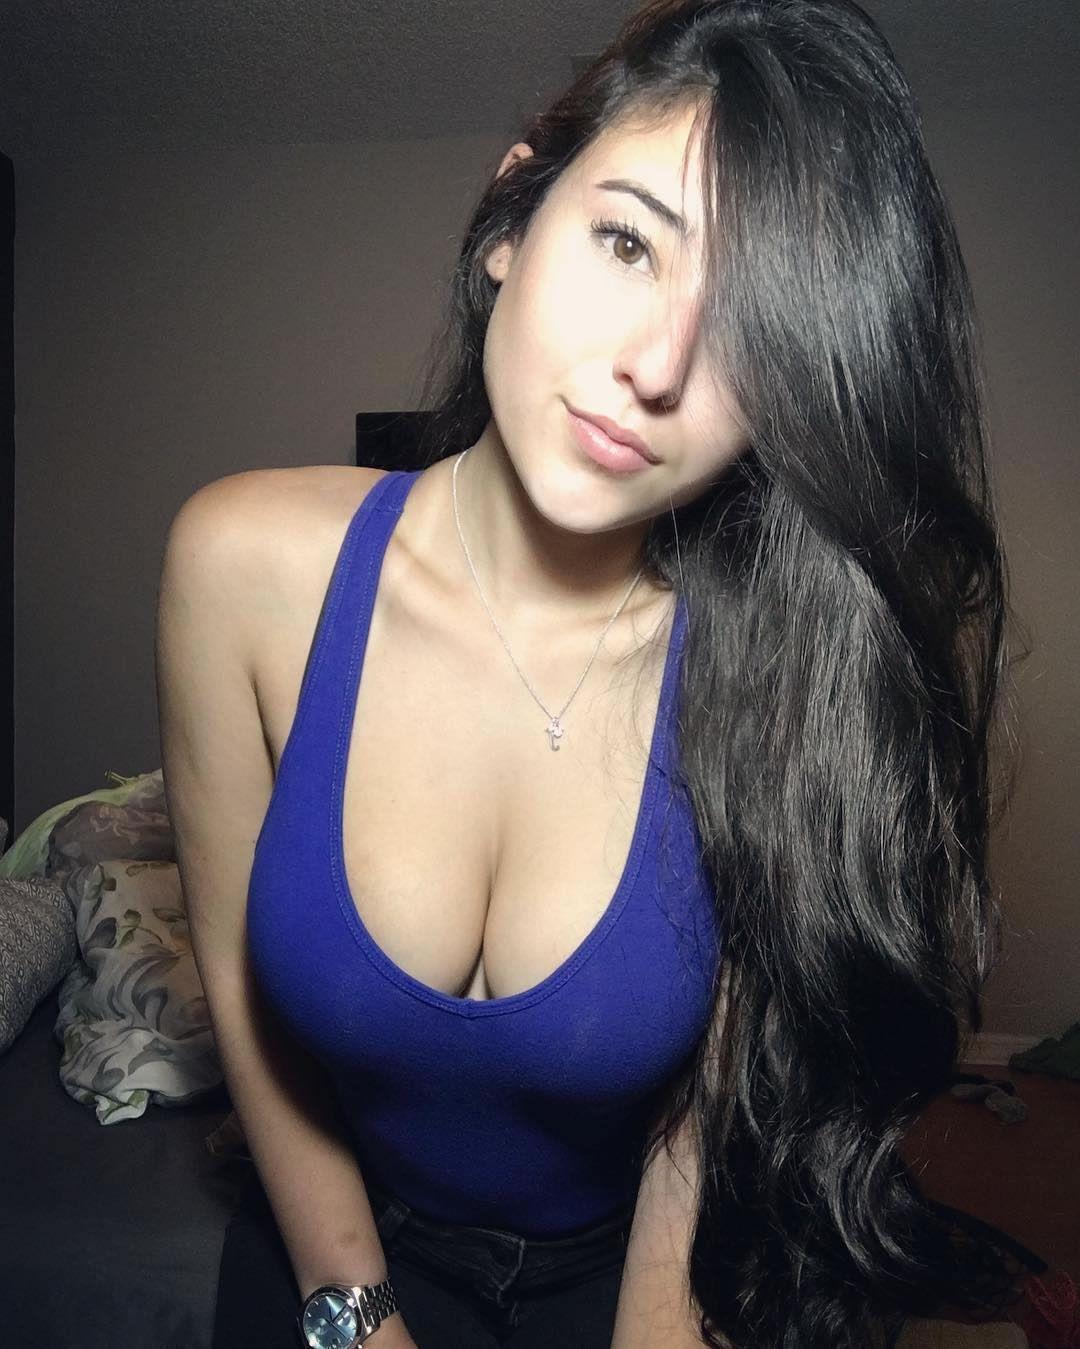 angie verona | sexygirls | pinterest | verona and girls